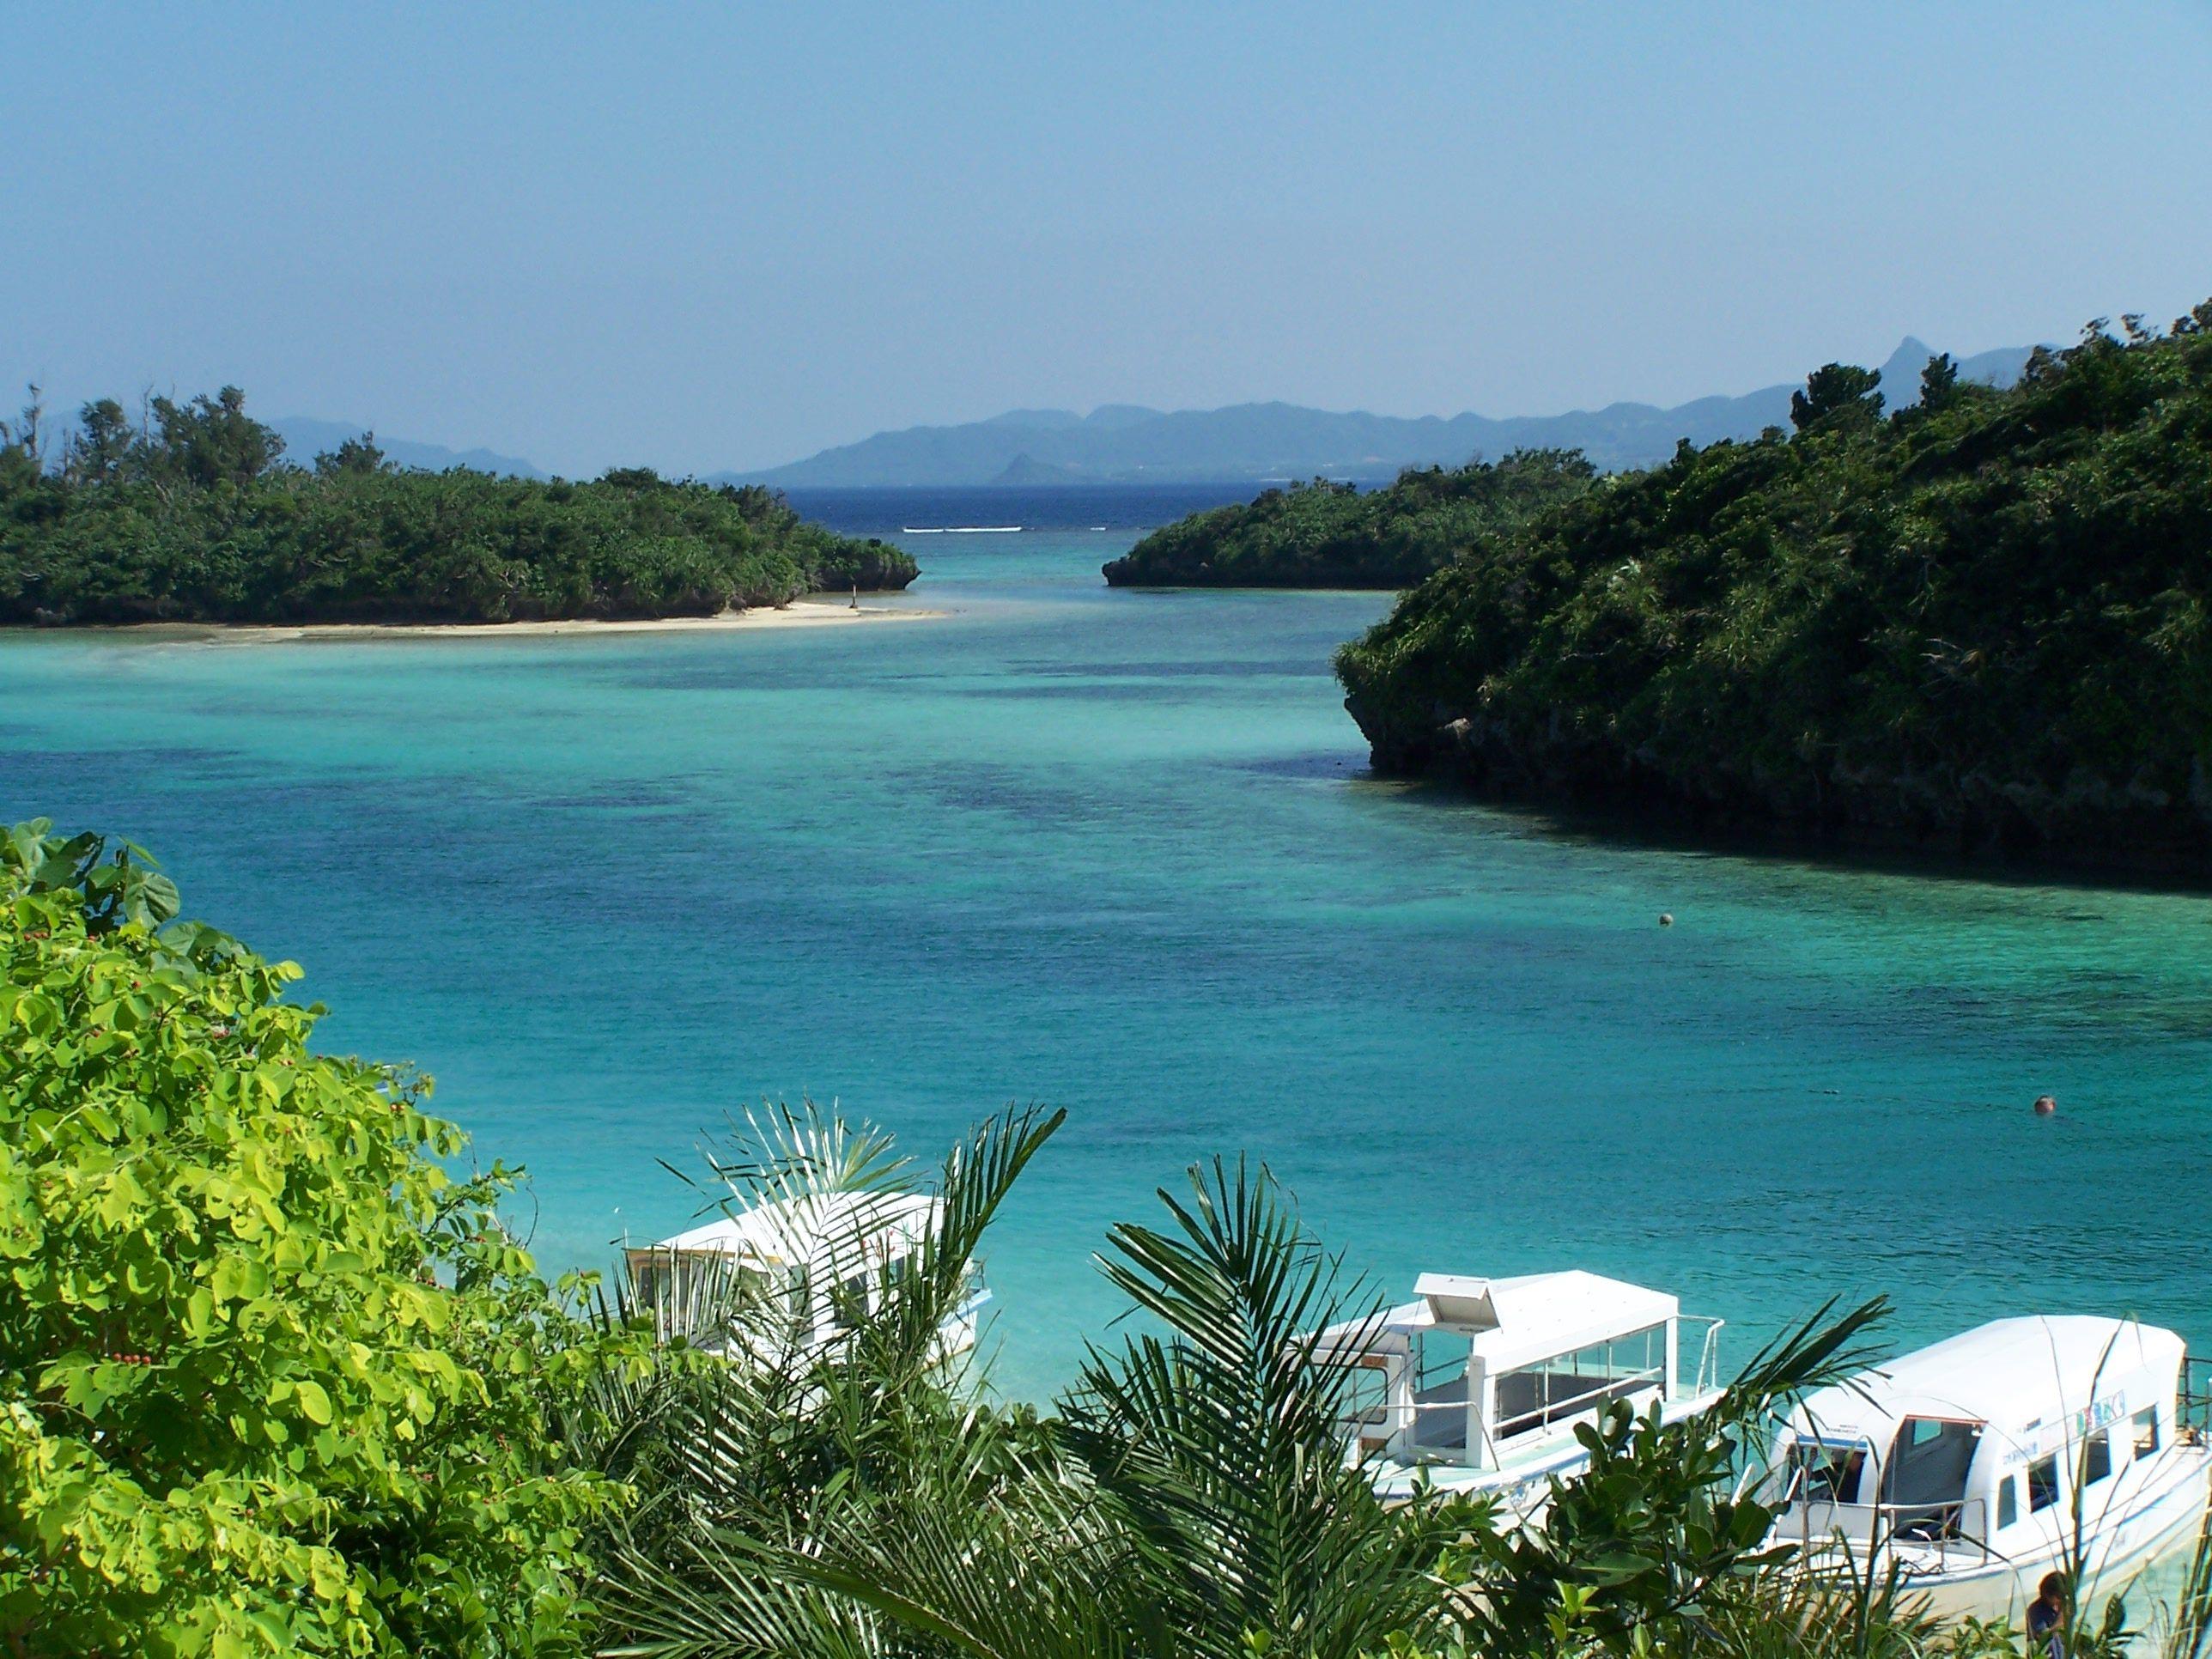 secret islands in the world